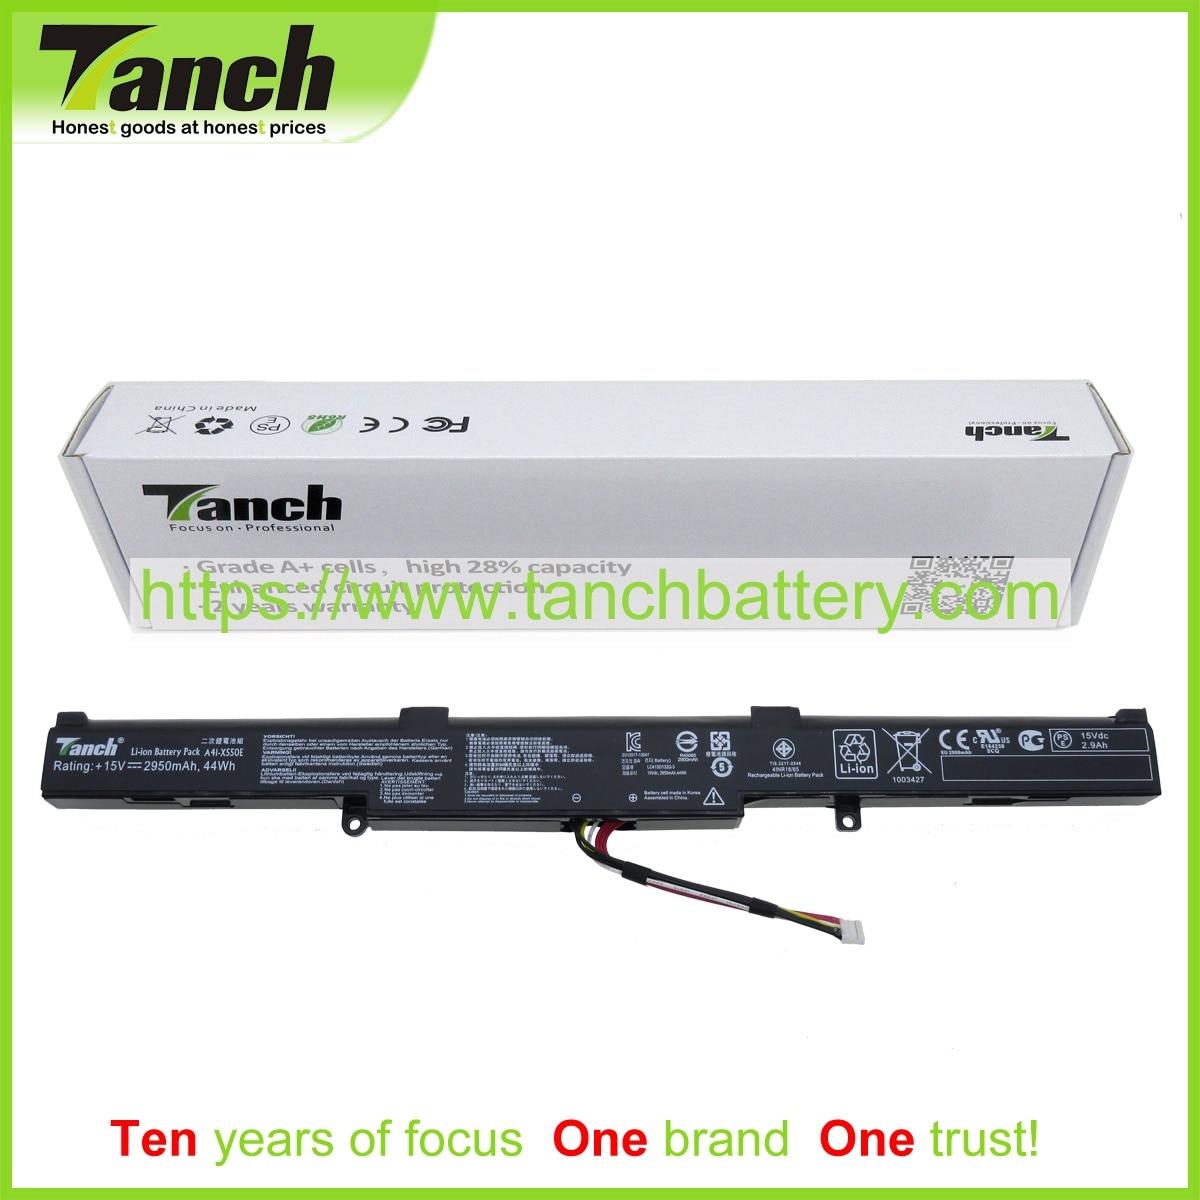 Tanch Laptop Battery for ASUS 0B110-00220100 CS-AUX450NB LC41LG130Q-7 A450 X751LB X751SJ F751MD R752MA 15V 4cell